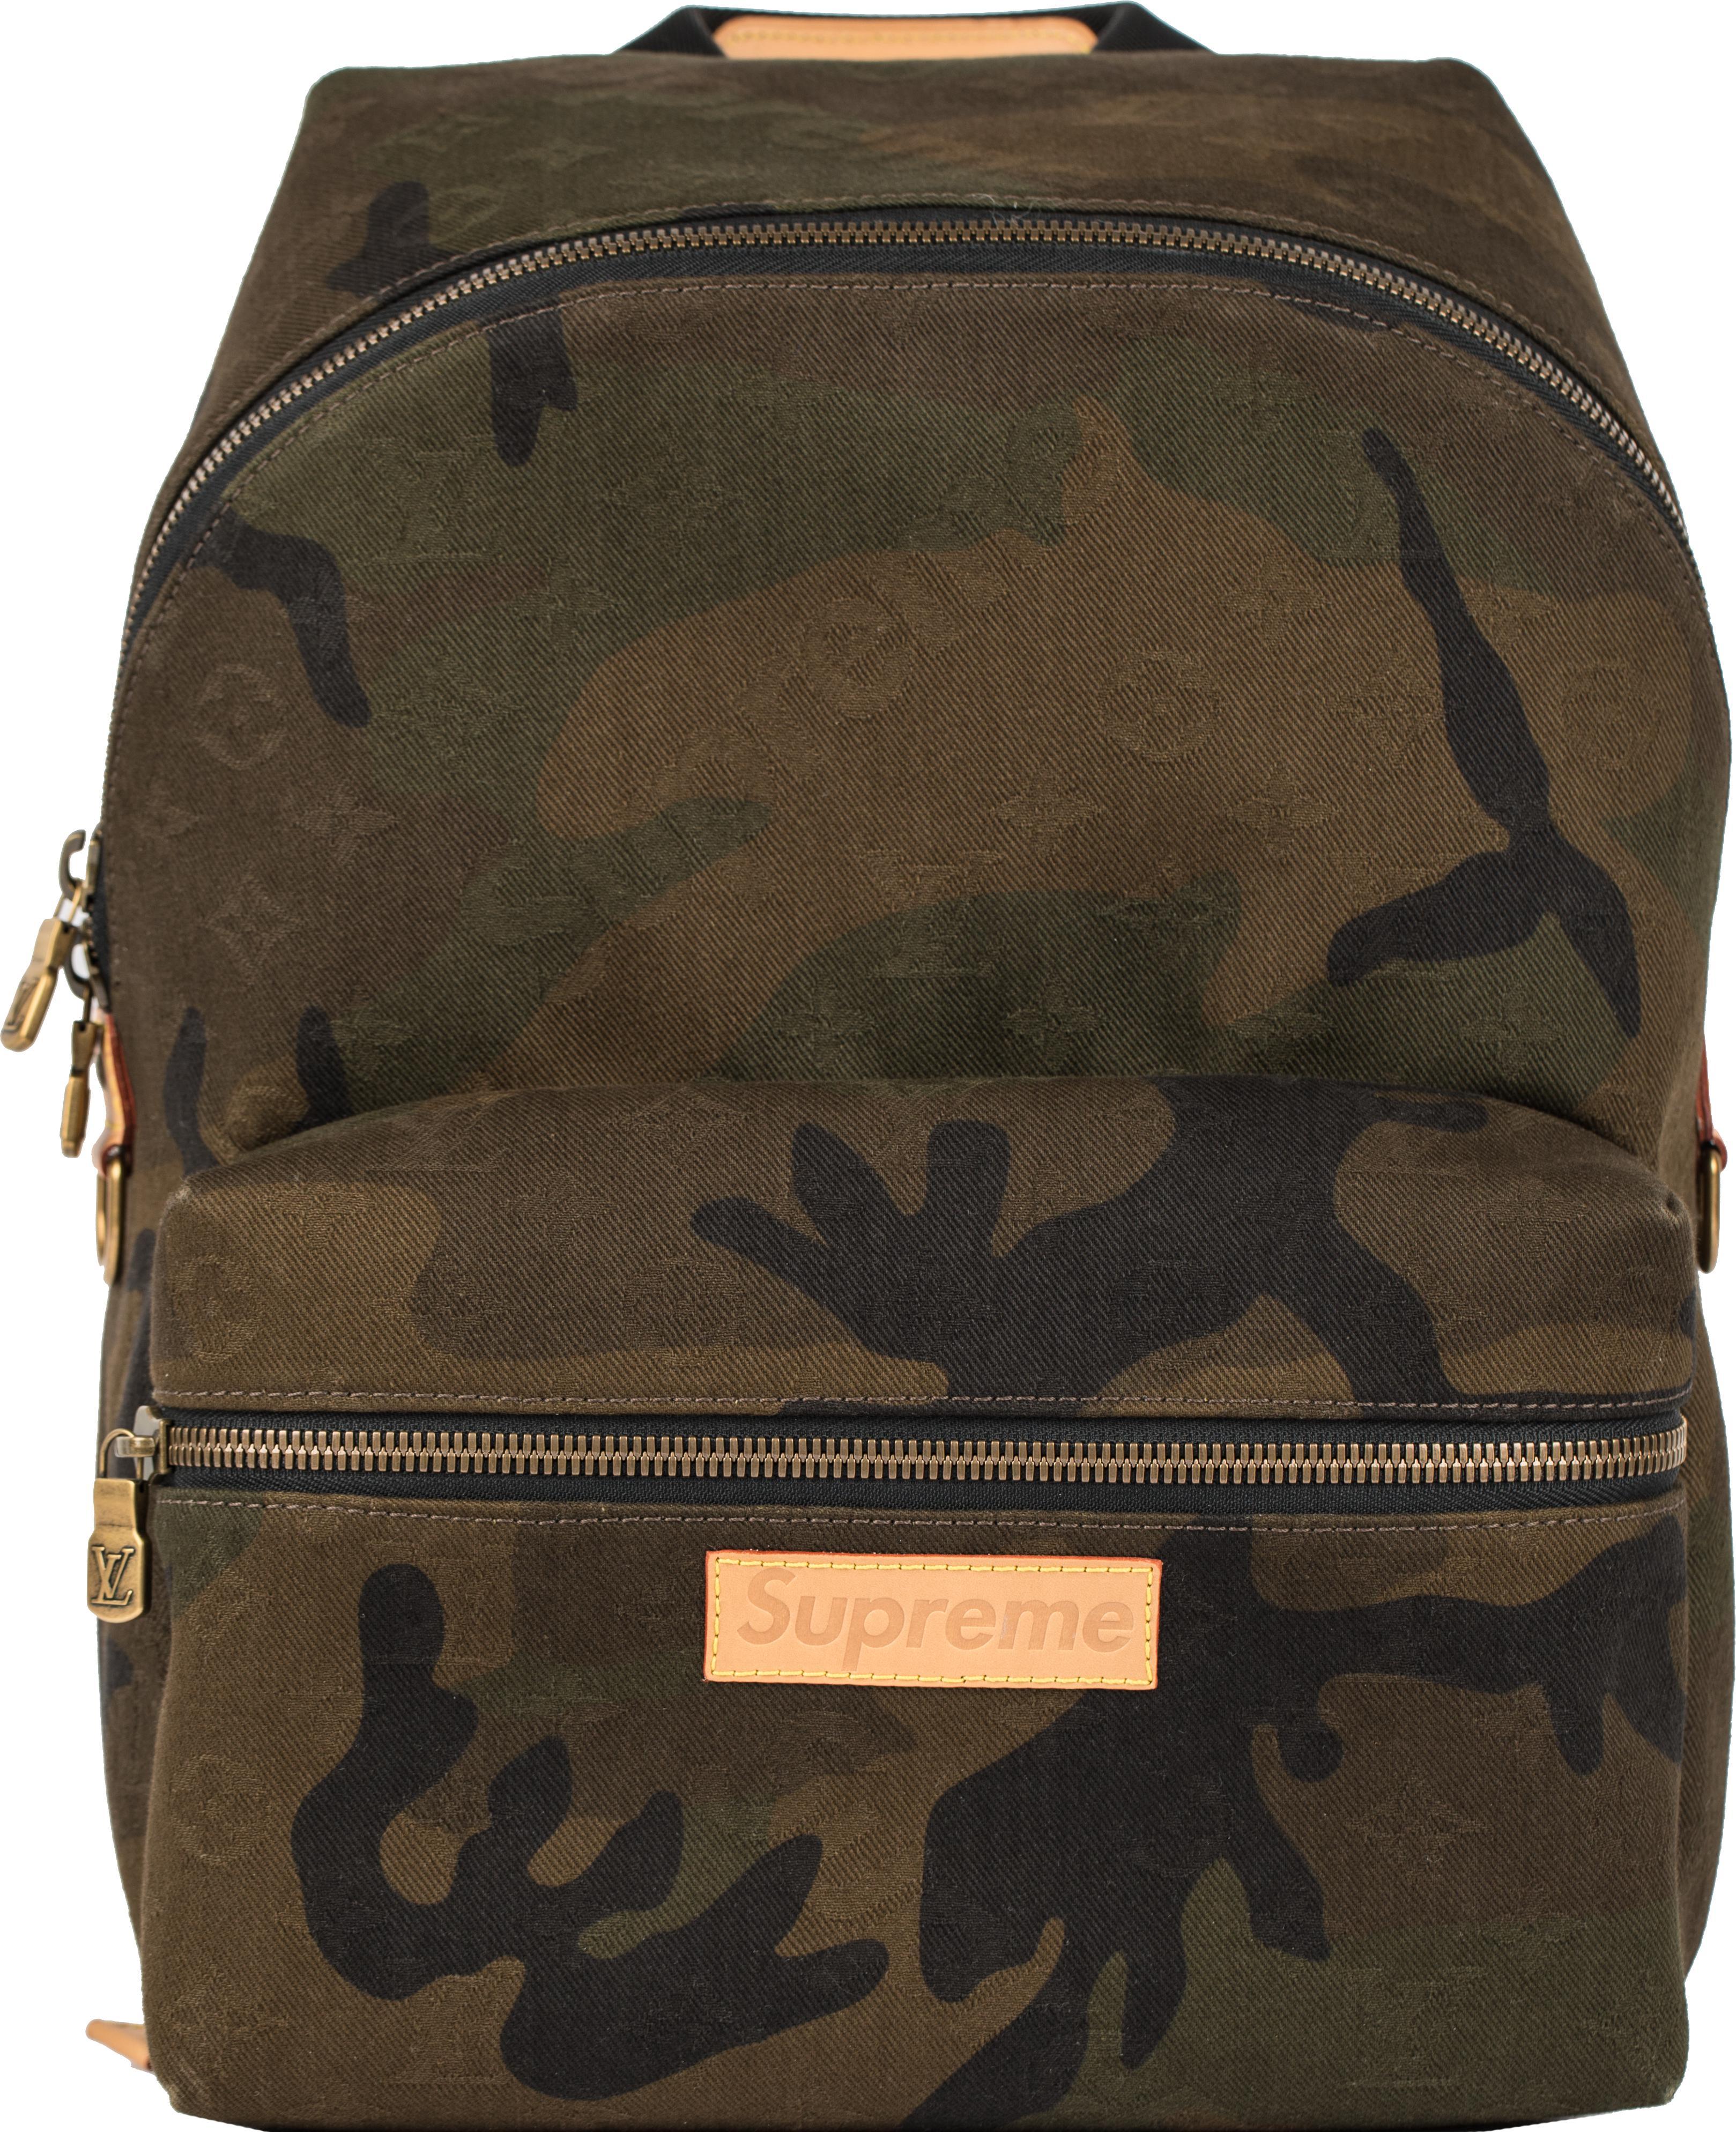 Supreme - Green Louis Vuitton X Apollo Backpack Monogram Camo for Men - Lyst.  View fullscreen 64cb1f4618e41